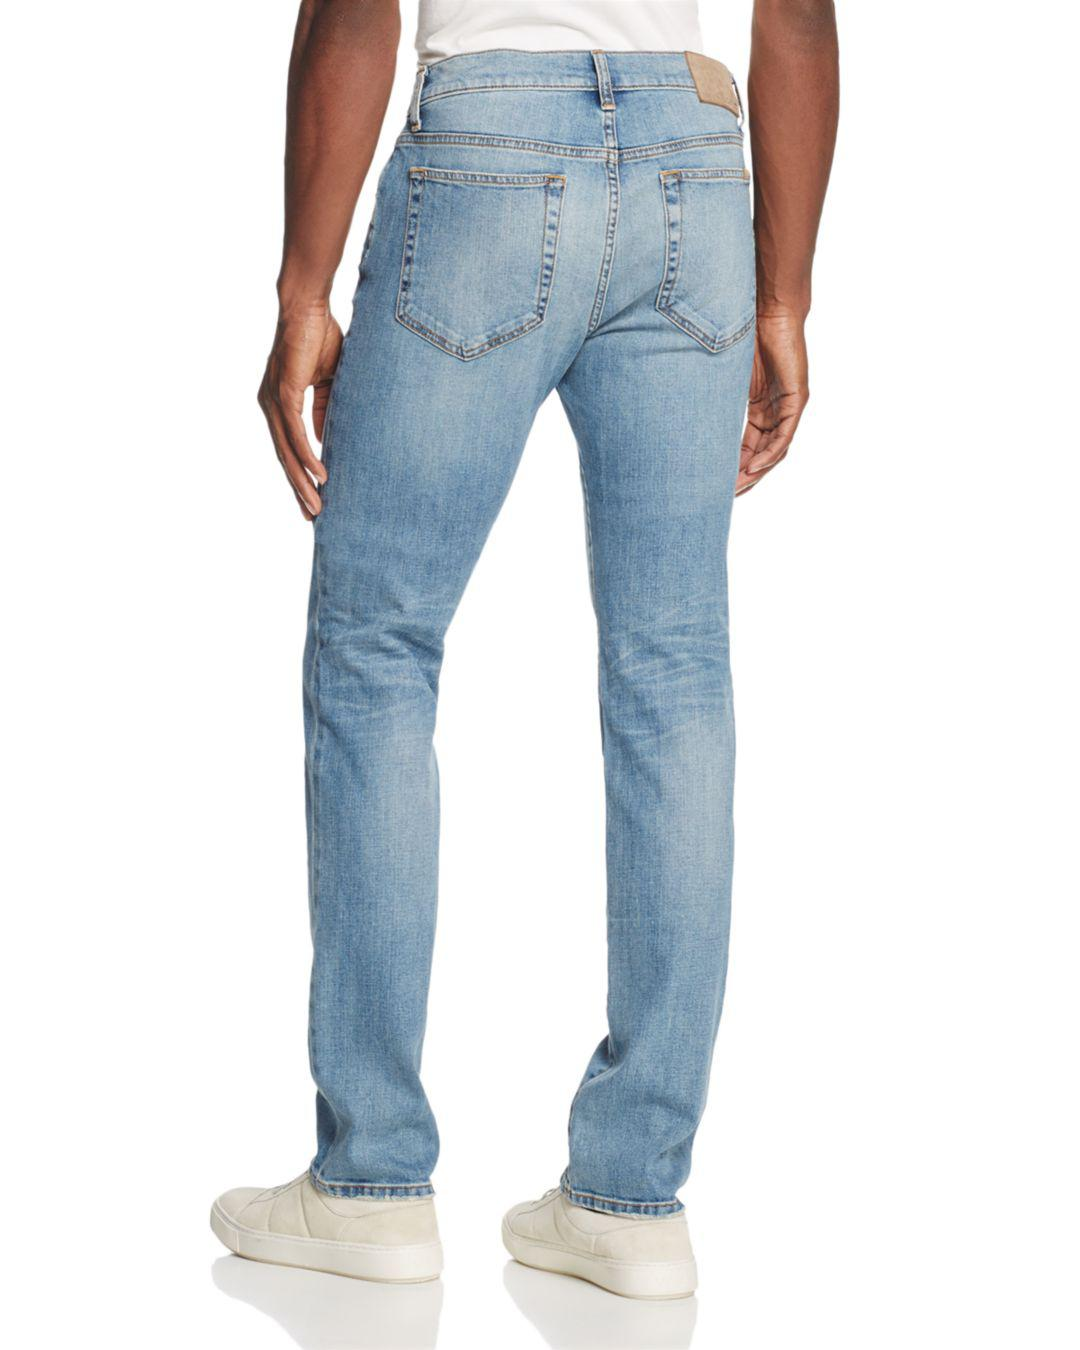 Joe's Jeans Denim Wyman Brixton Slim Straight Fit Jeans In Light Blue for Men